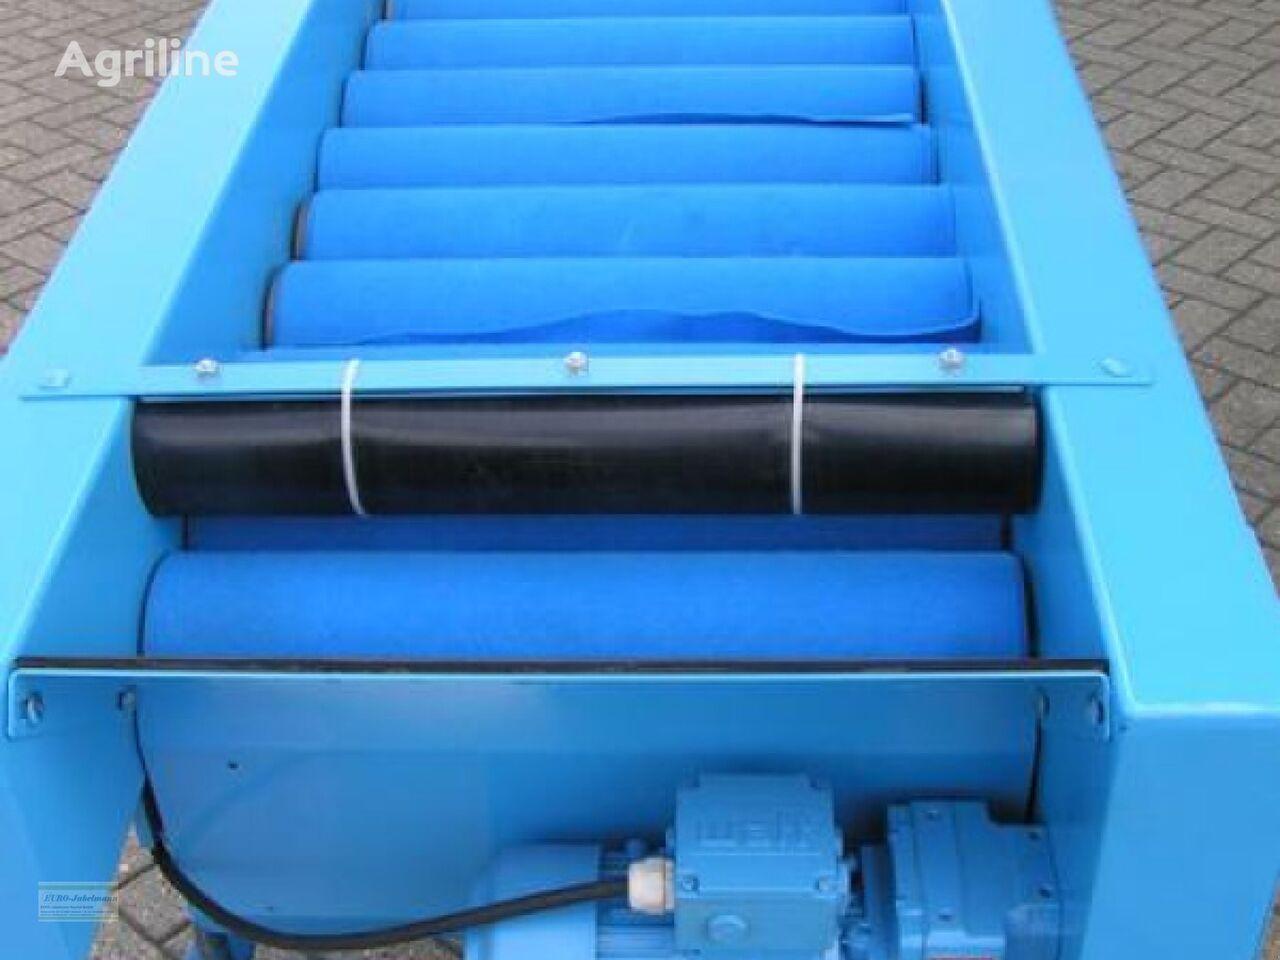 mașină de spălat zarzavaturi EURO-Jabelmann Walzentrockner V 5514 WT nou